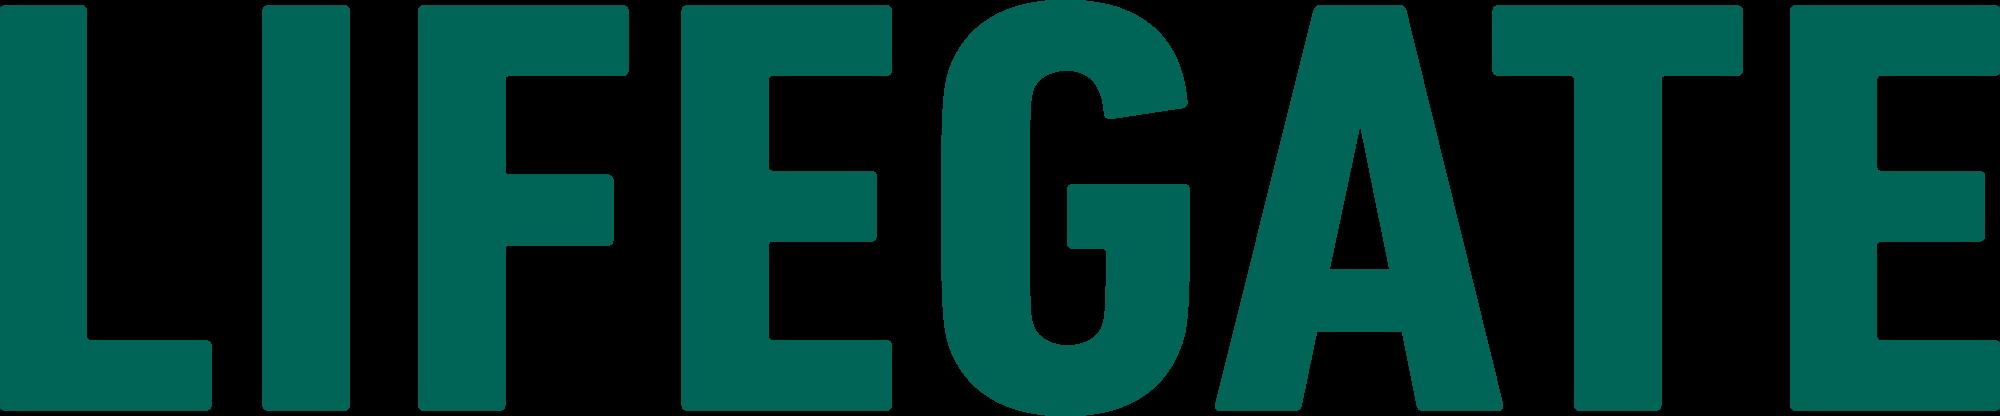 lifegate-logo